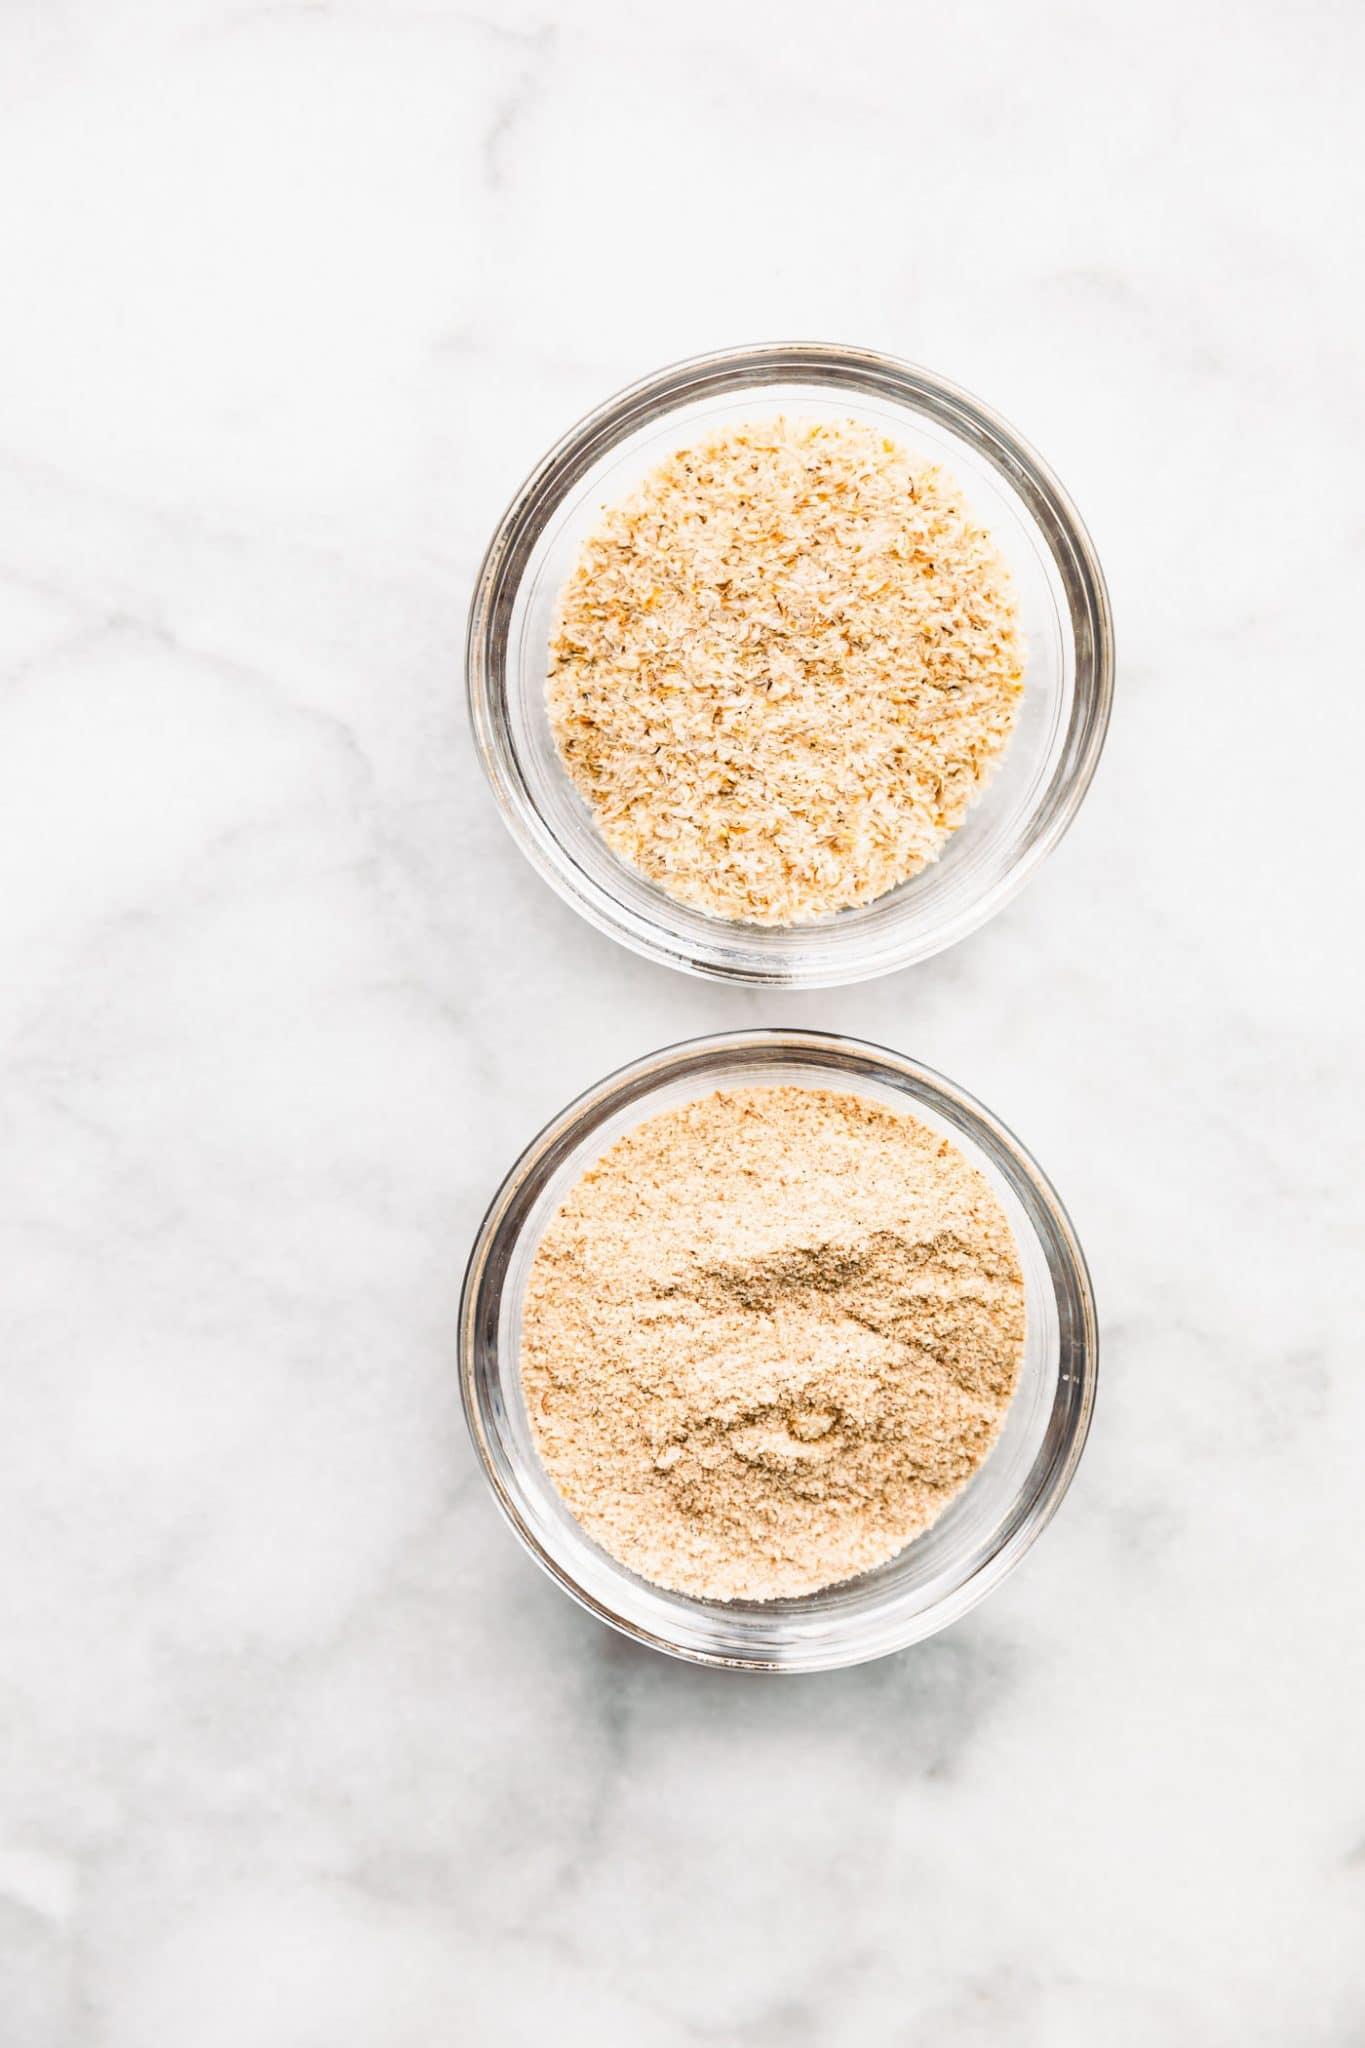 Psyllium Husk Fiber and powder in a comparison shot side by side.